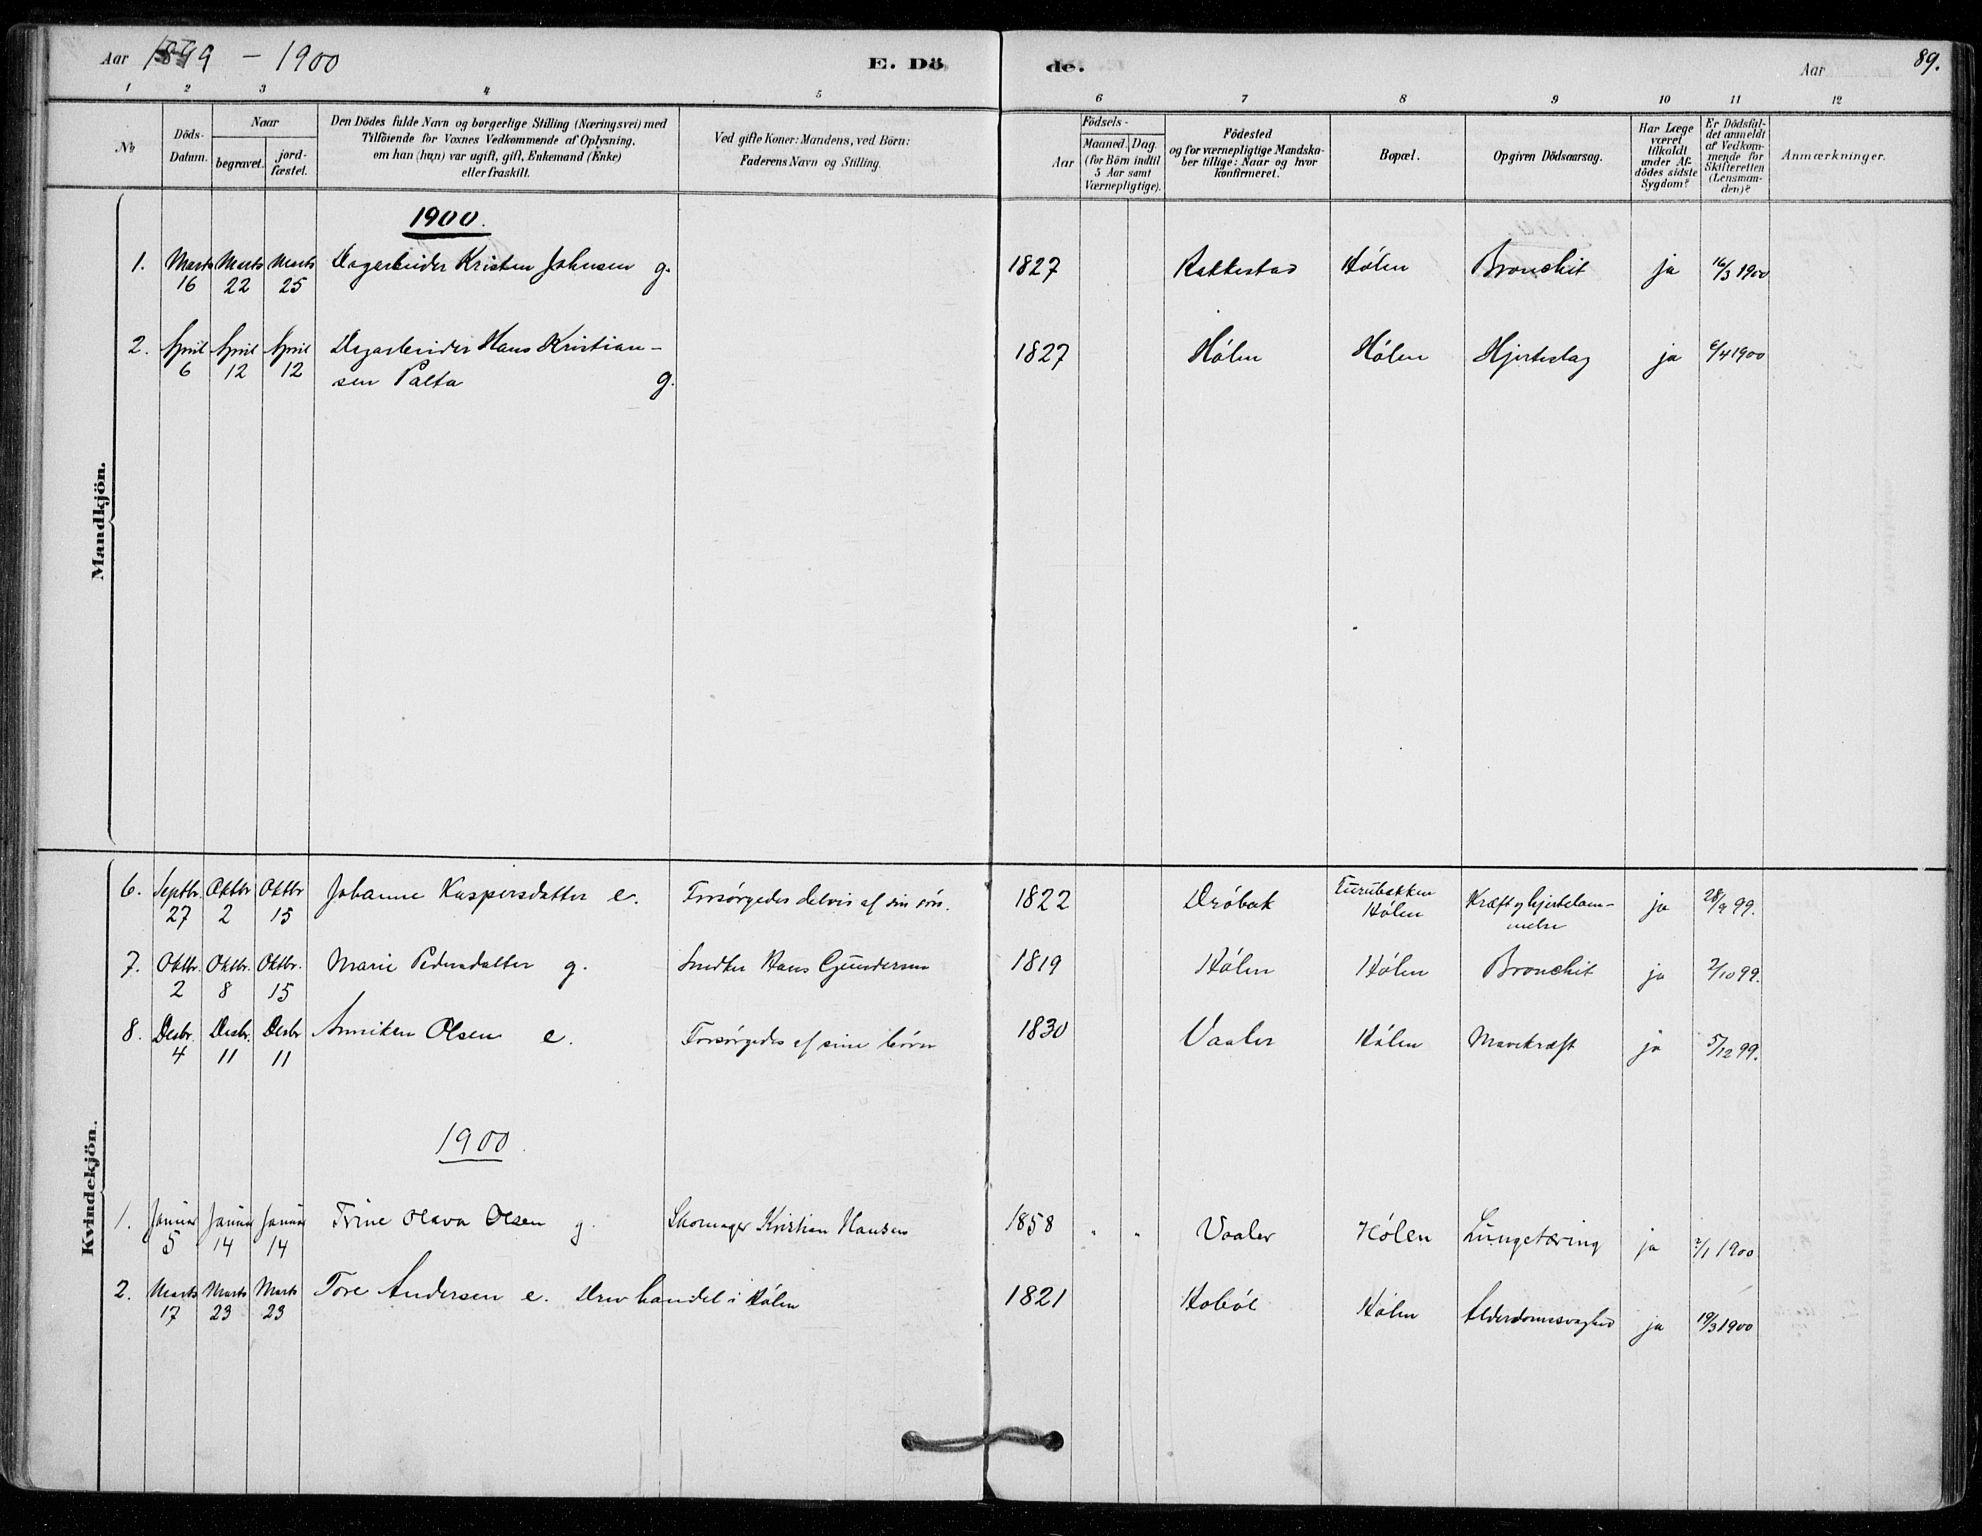 SAO, Vestby prestekontor Kirkebøker, F/Fe/L0001: Ministerialbok nr. V 1, 1878-1931, s. 89